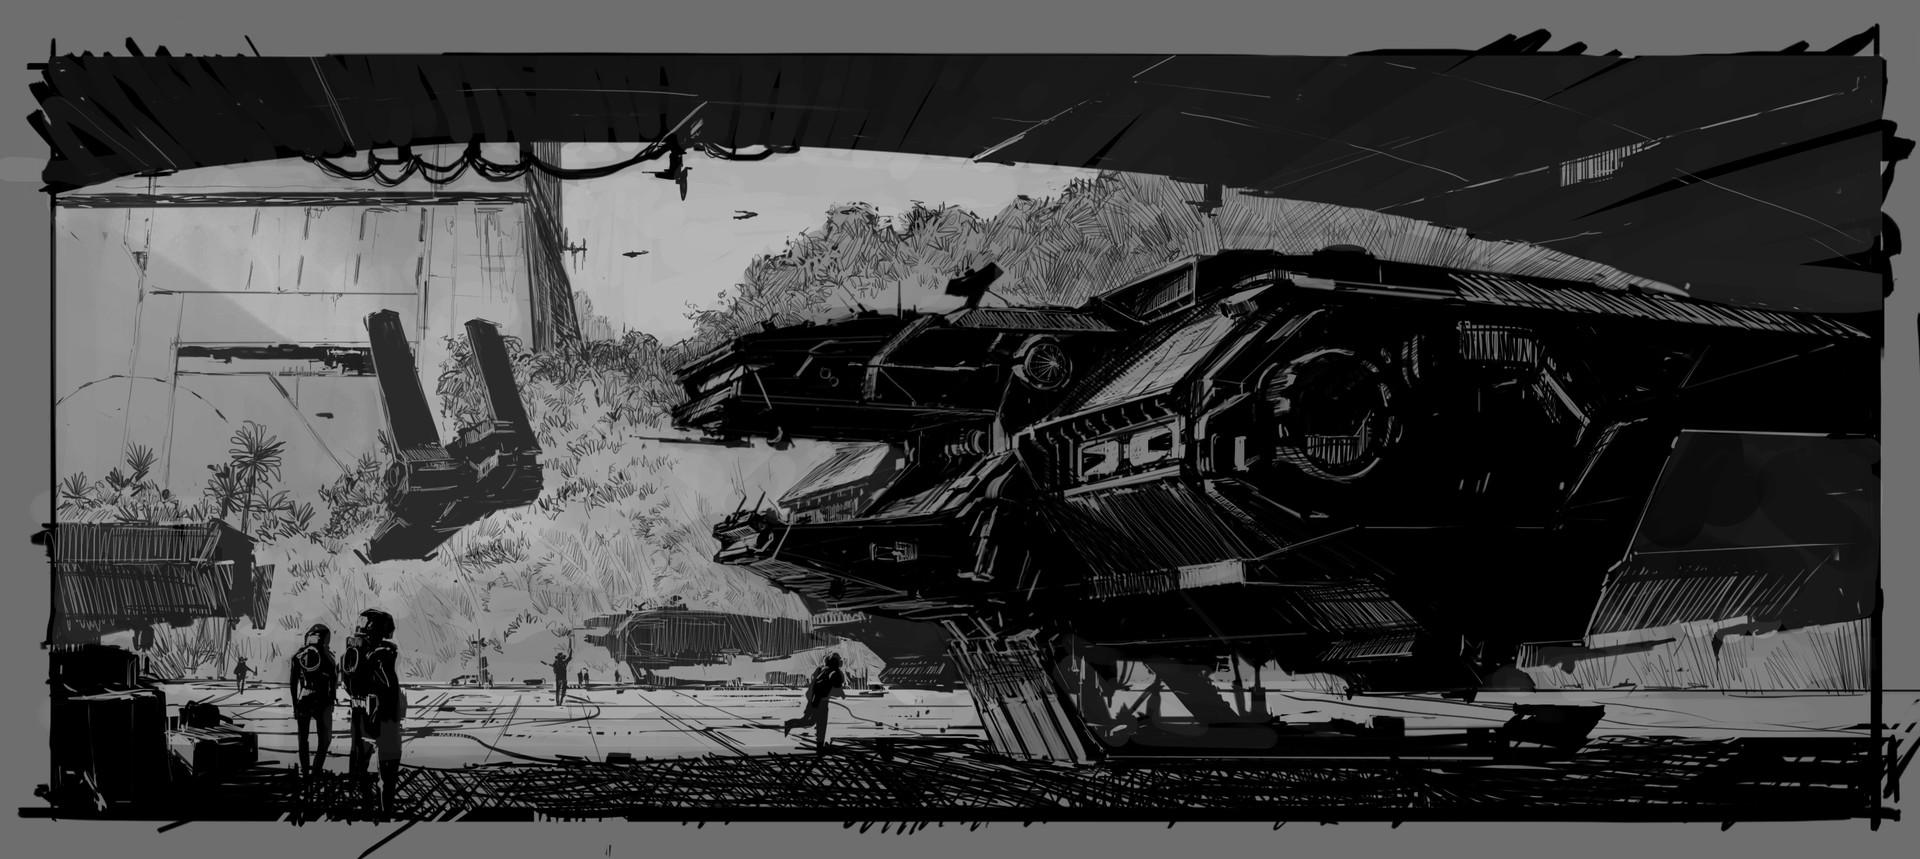 martin-deschambault-black-white-hangar-s